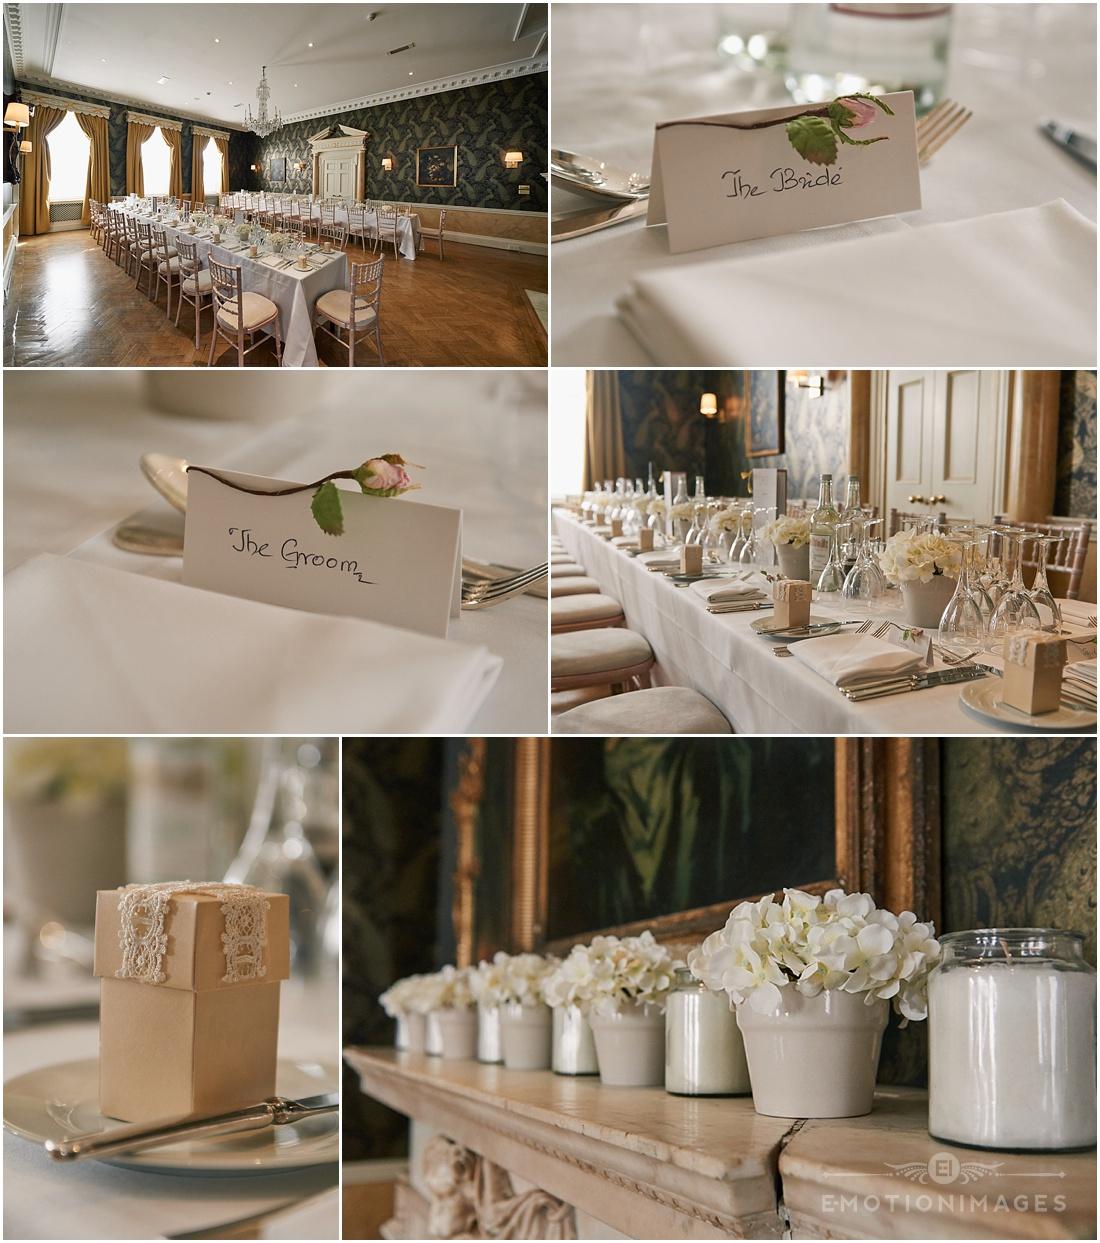 Searcys_Knightsbridge_London_wedding_e-motion_images_002.JPG